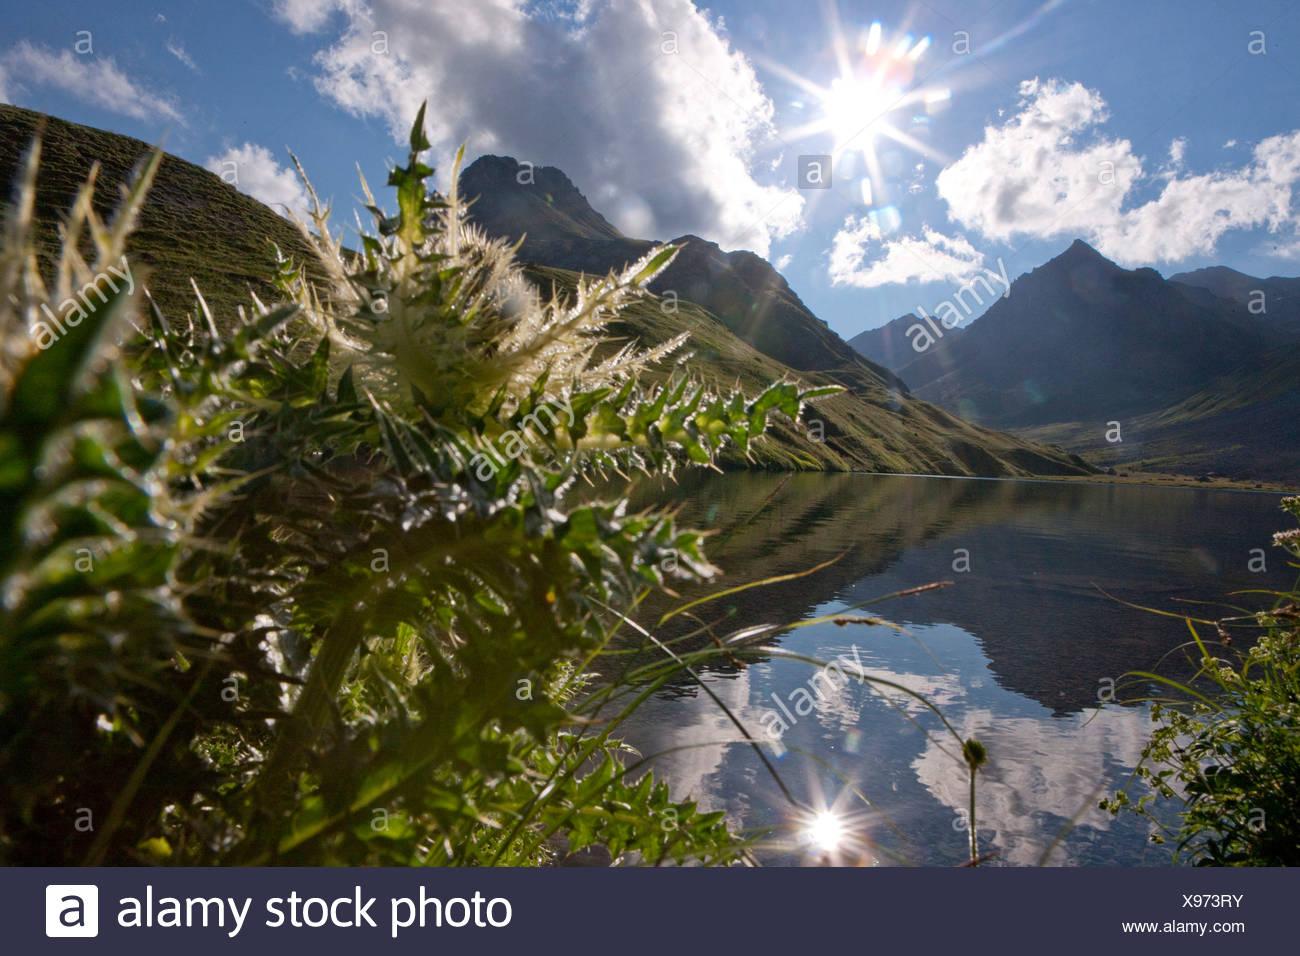 Thistle, Alplisee, Arosa, canton, GR, Graubünden, Grisons, mountain lake, lake, flower, flowers, sun, Switzerland, Europe, Stock Photo